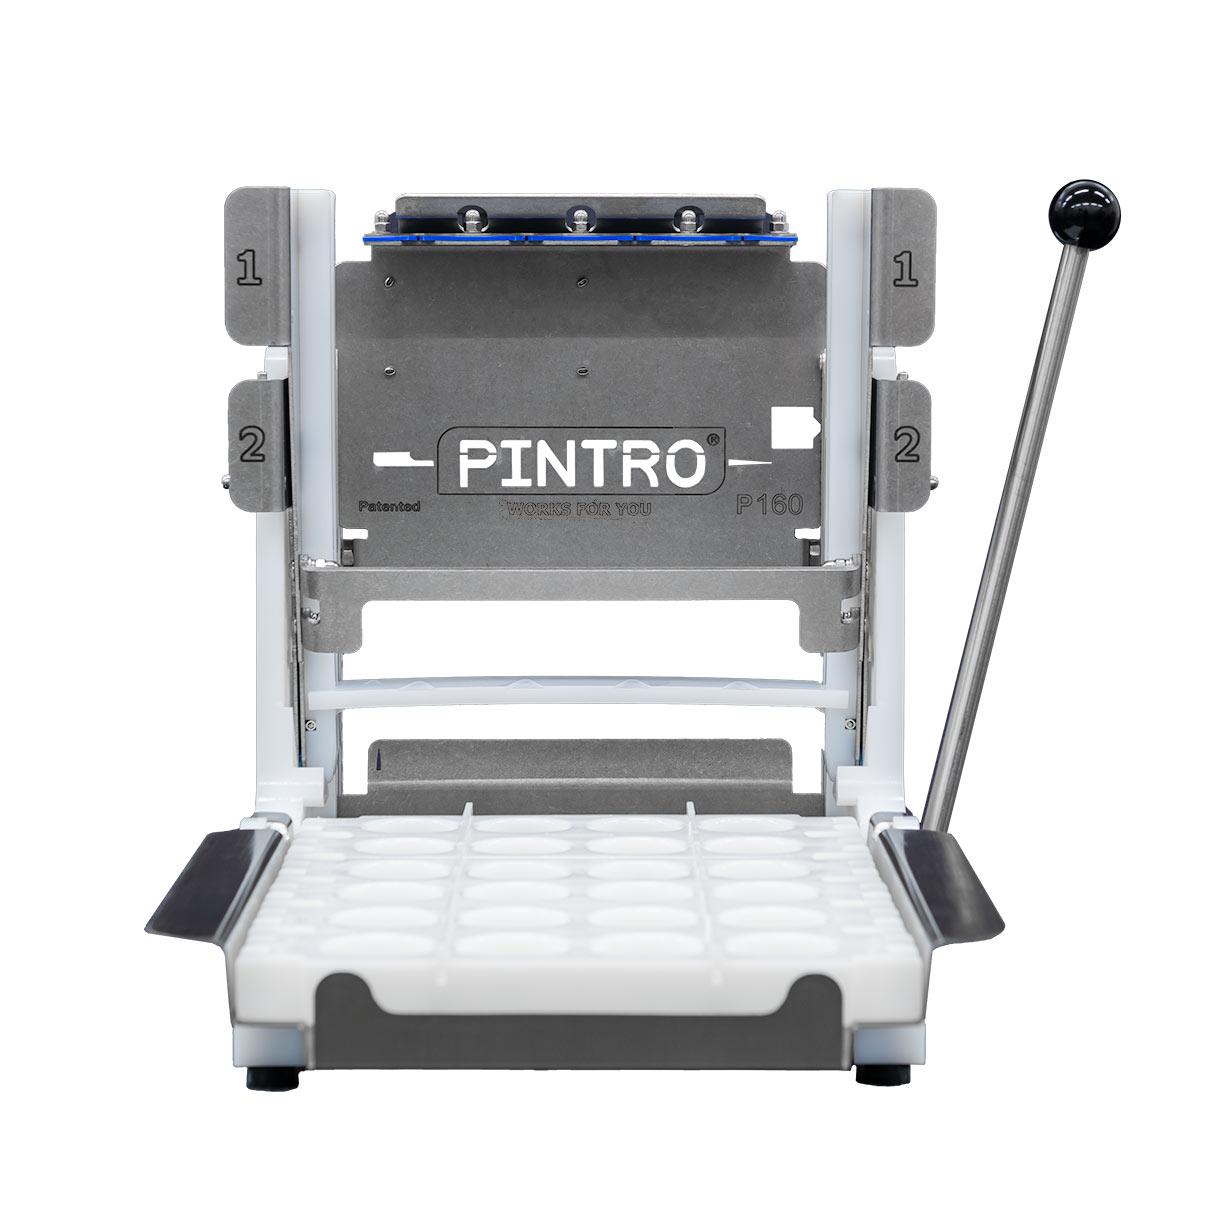 PINTRO P160 manuele spies- en brochettemachine